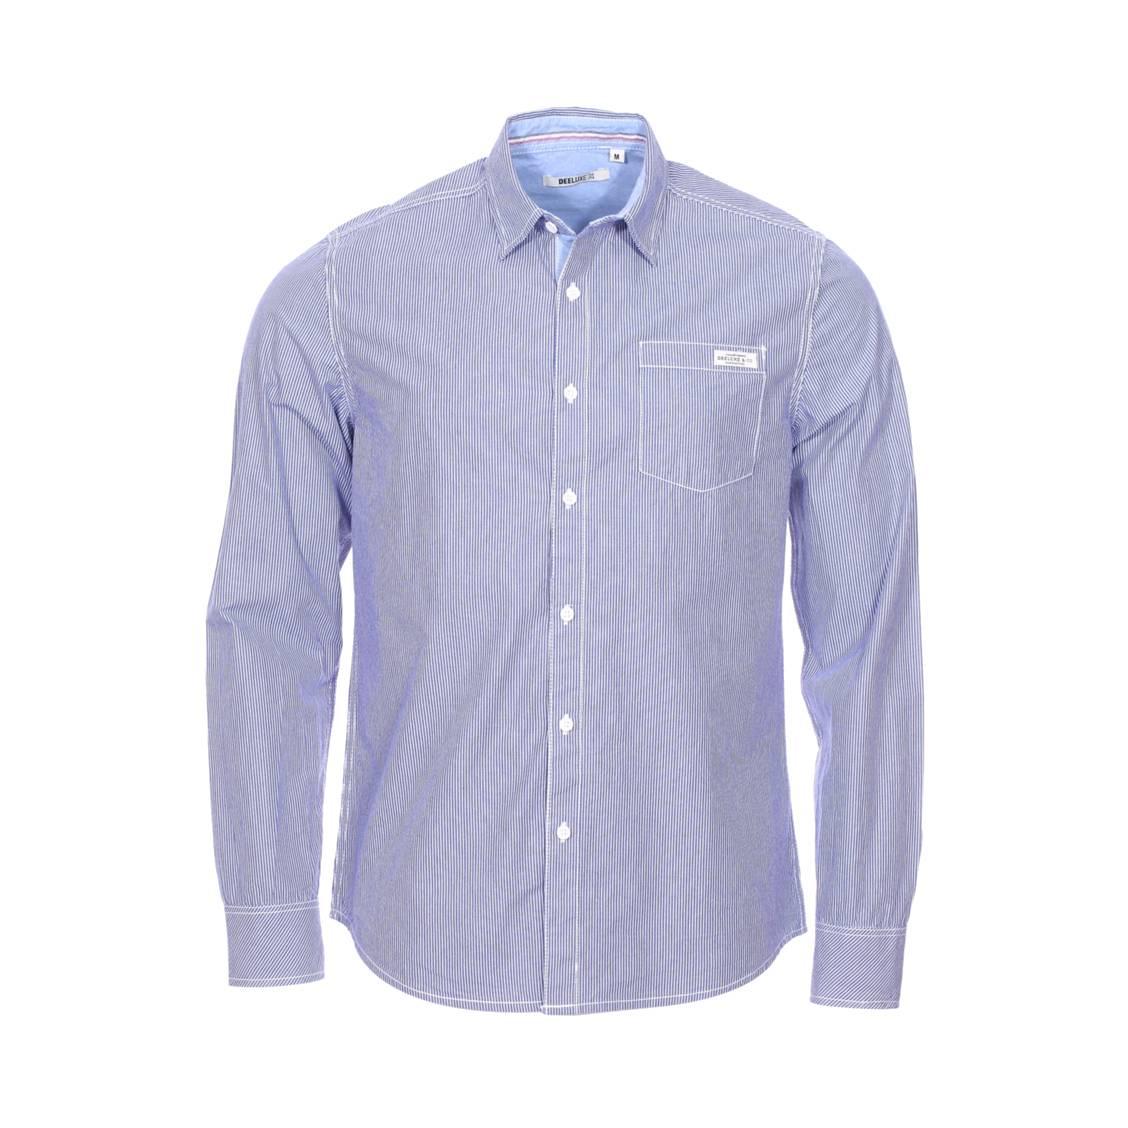 Chemise ajustée  campo en coton bleu indigo à rayures blanches